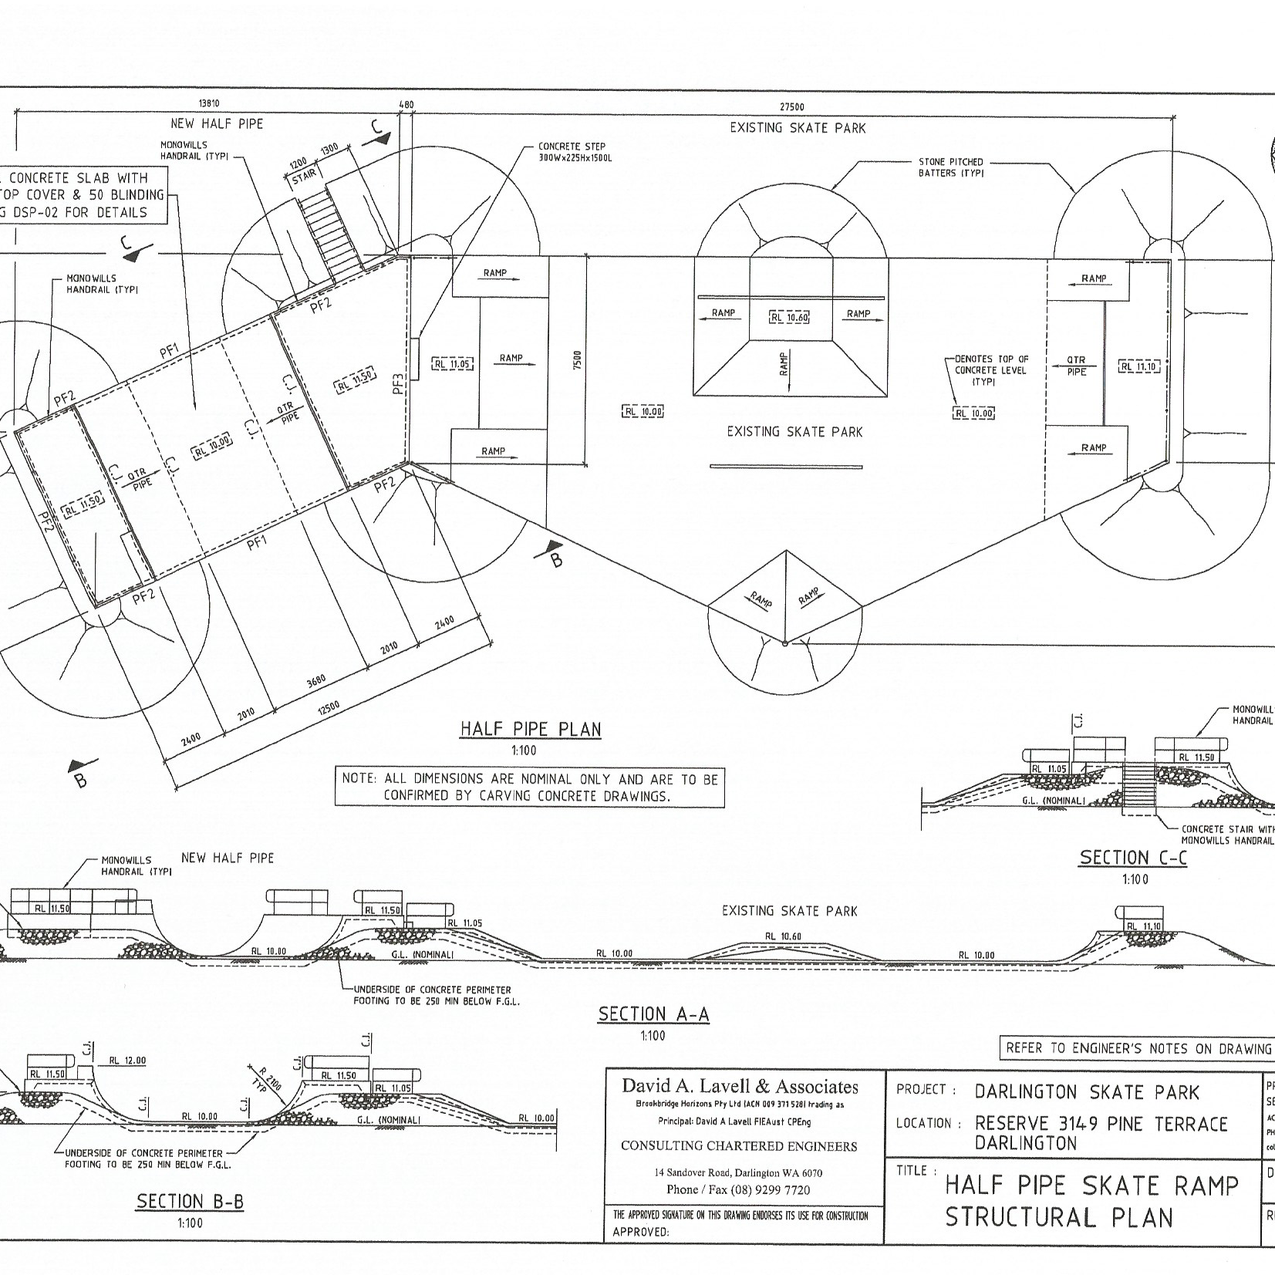 Half-Pipe Final Location Plan